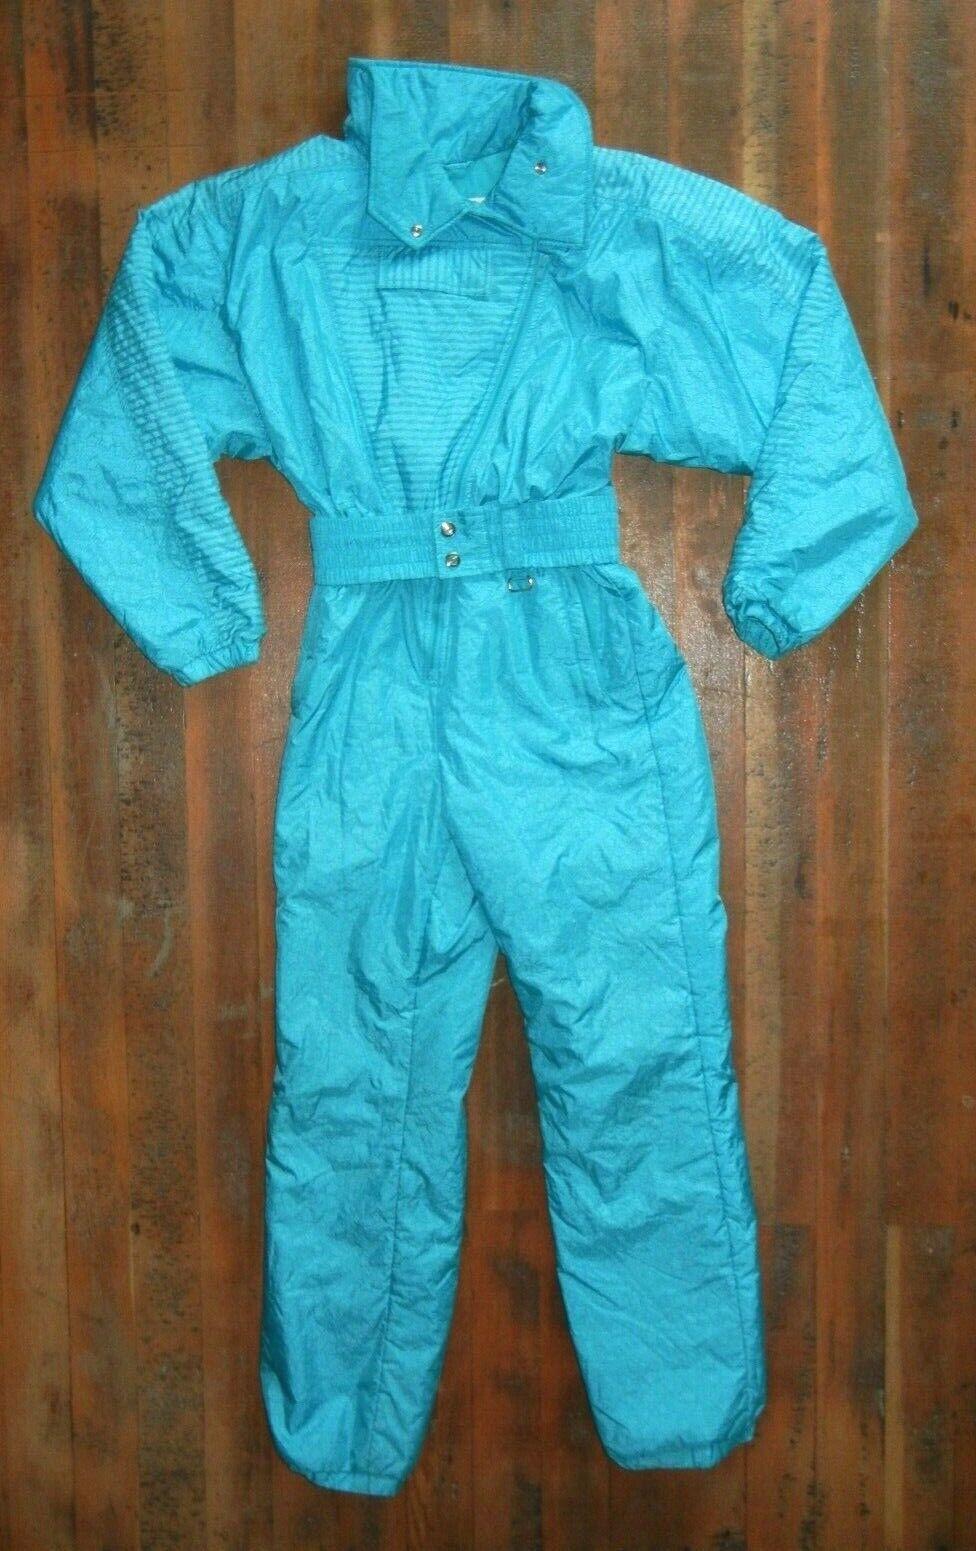 Vtg 90s NILS Bright Teal SKI SUIT Winter Jacket Coat Snow Pants Lady damen SZ 14